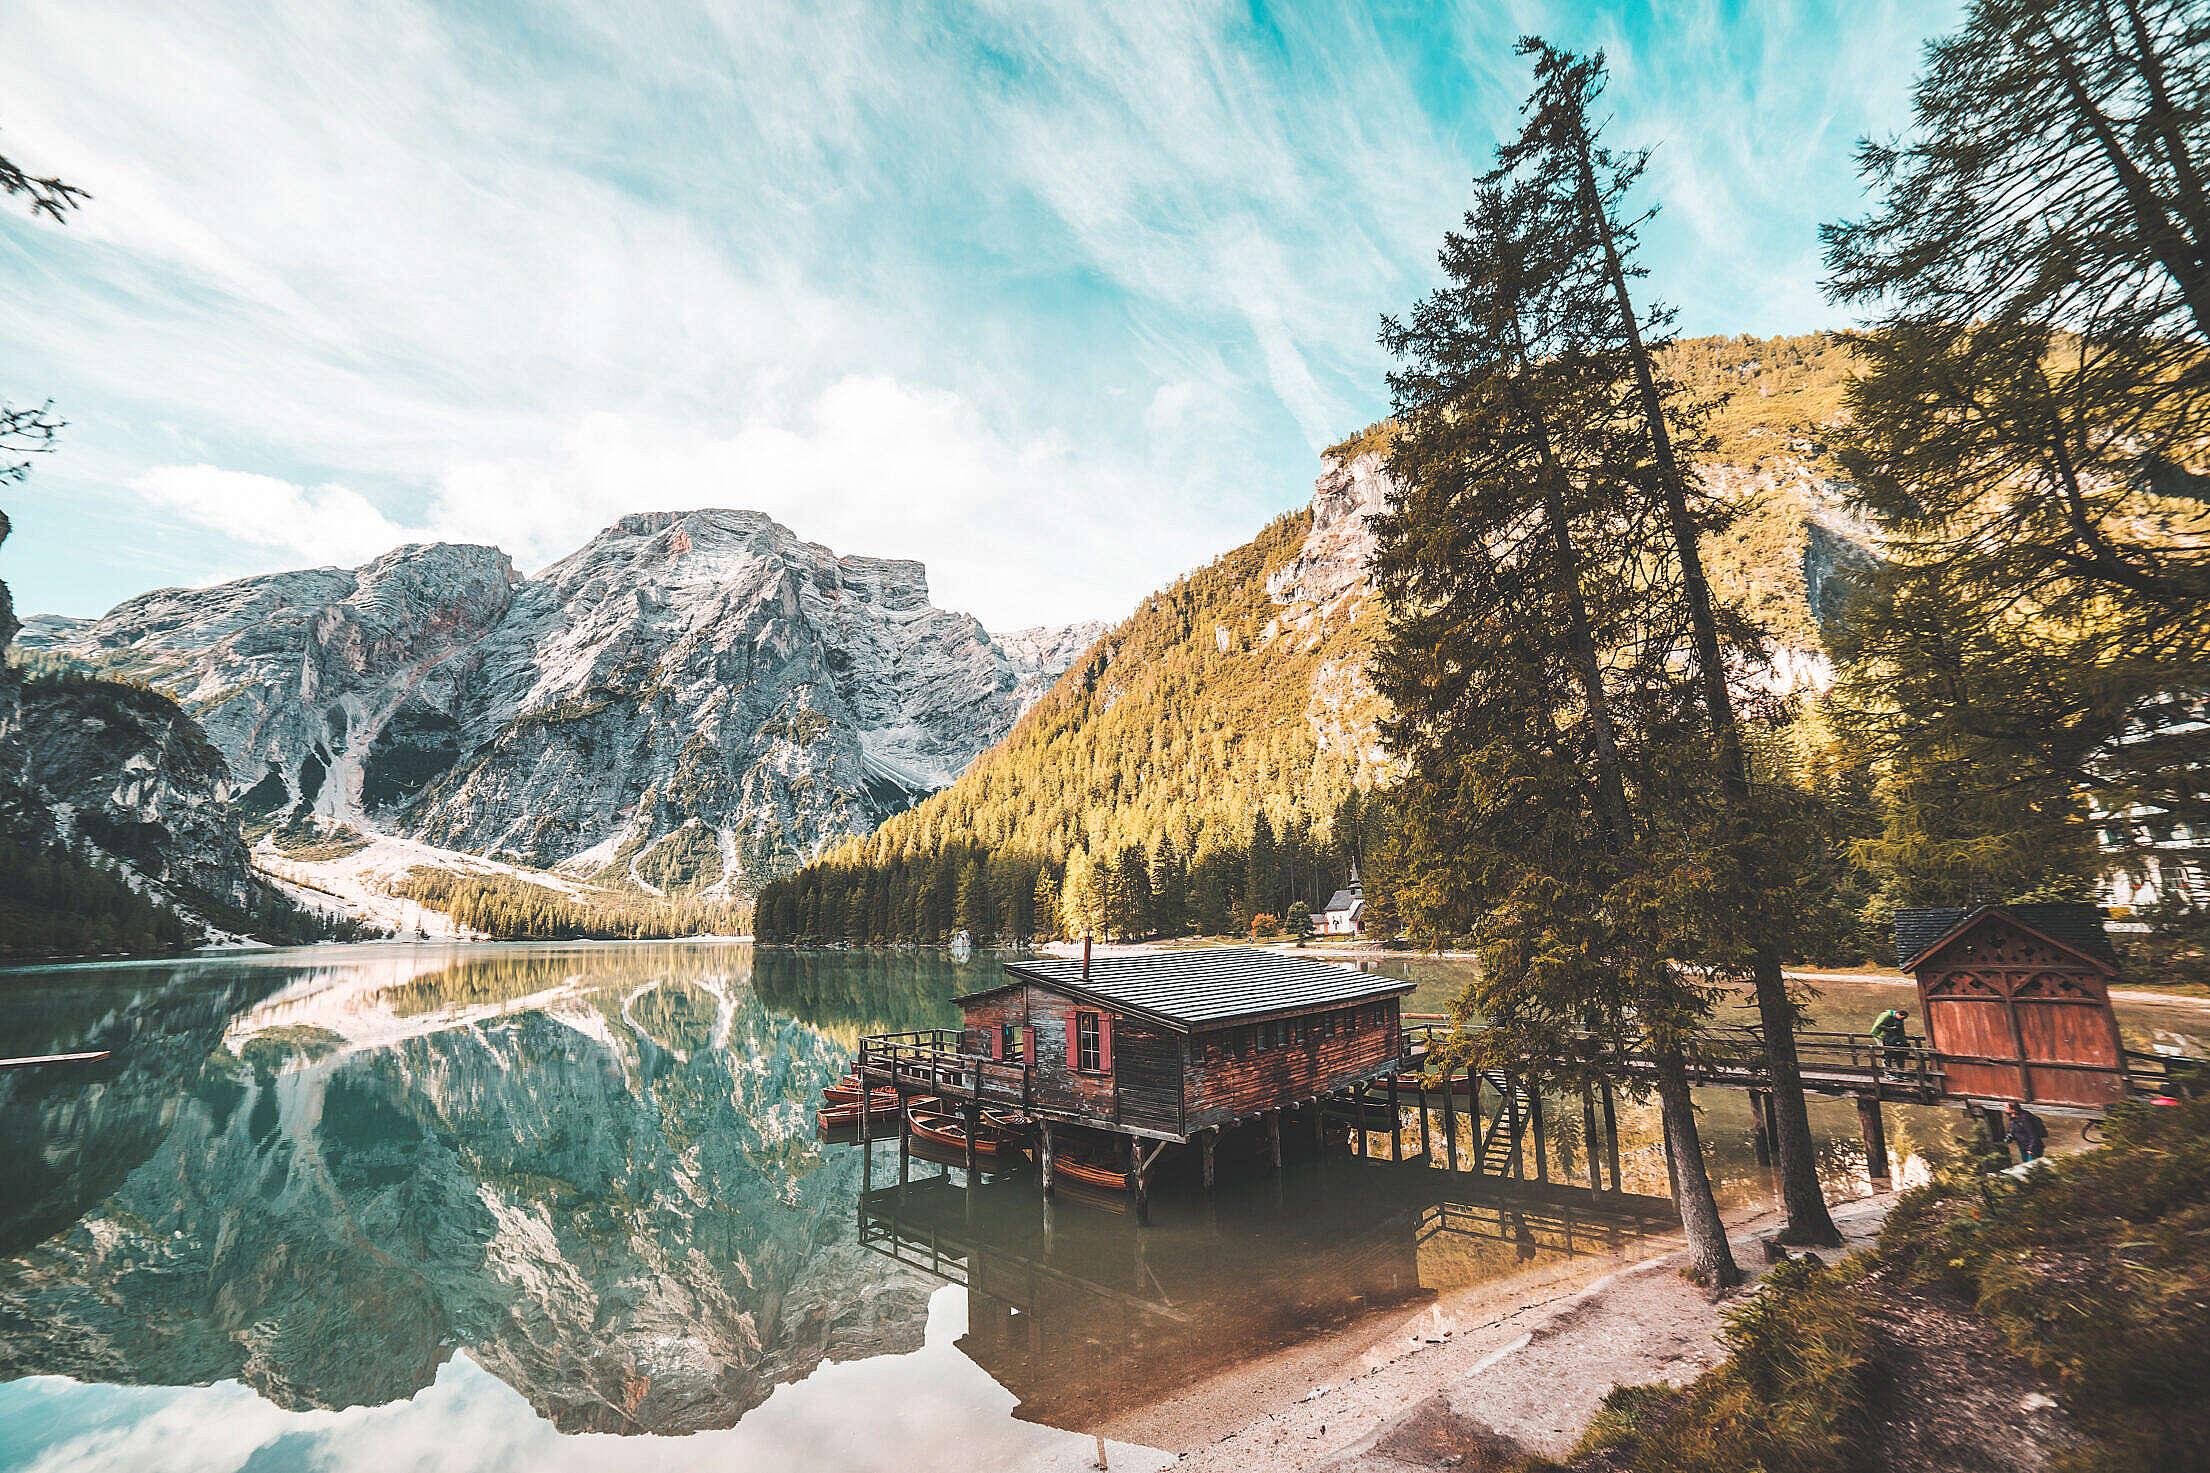 Old Wooden House on Braies Lake, Italy Dolomites Free Stock Photo